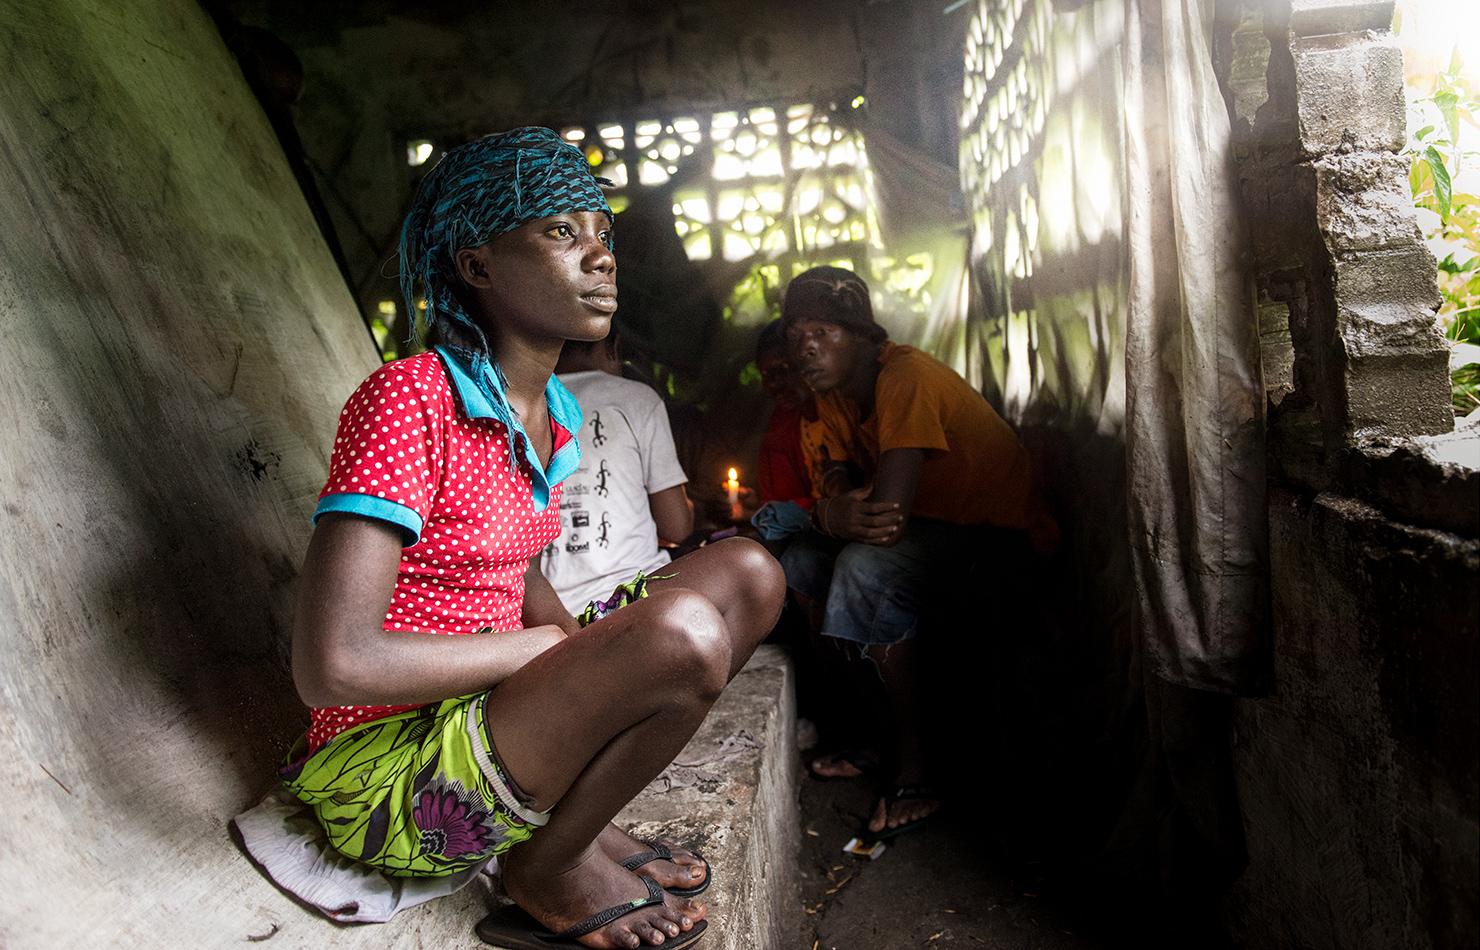 Liberia cemetery documentary